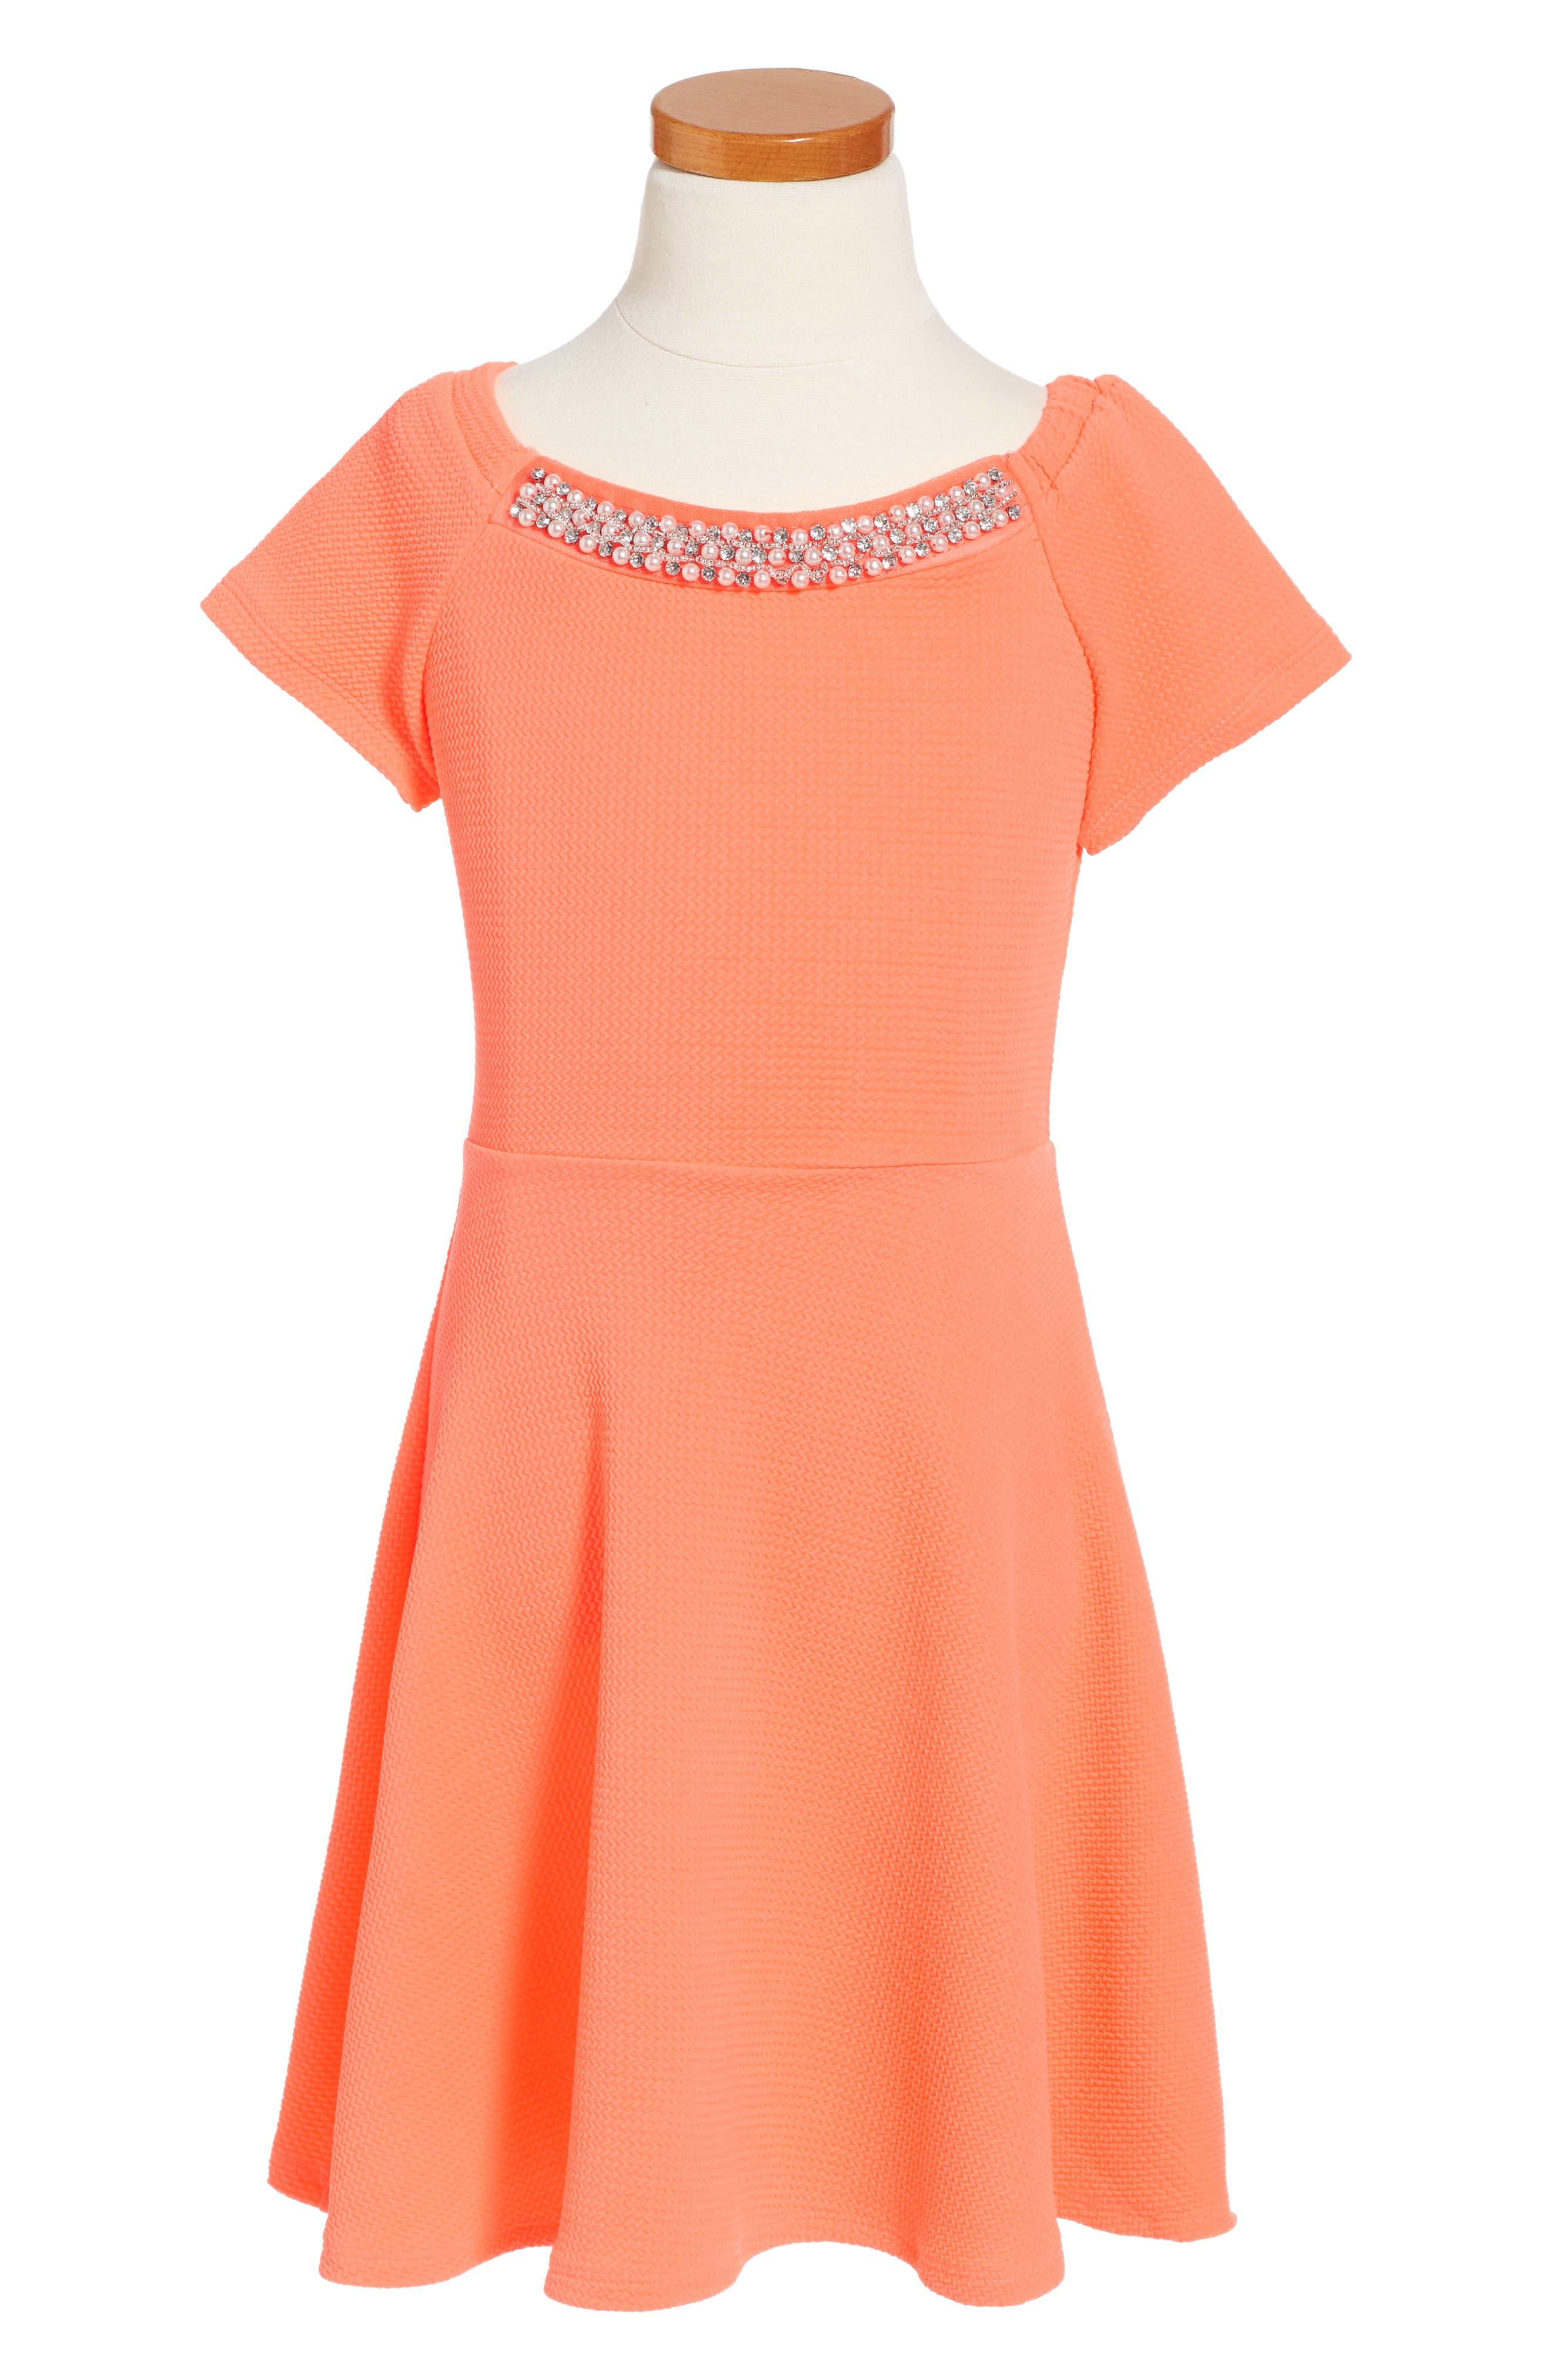 Skater Dress,                             Main thumbnail 1, color,                             820